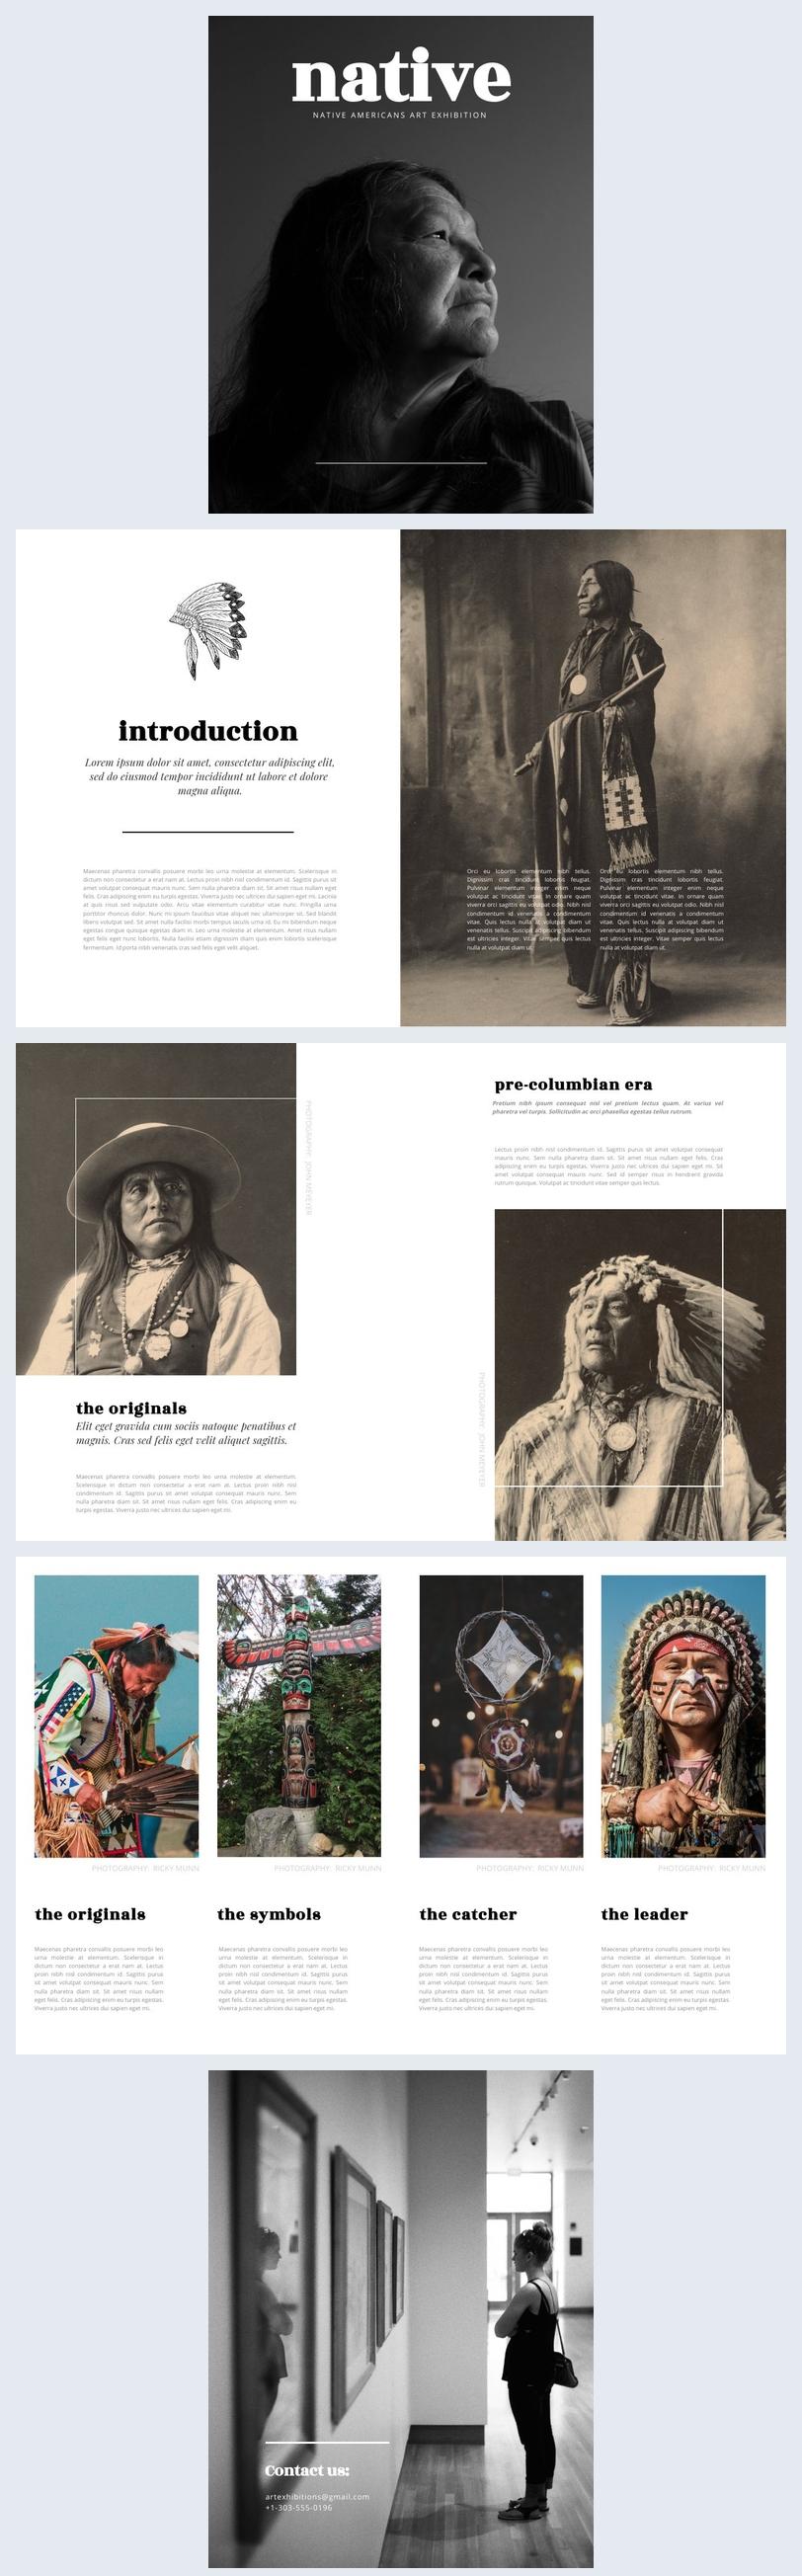 Art Exhibition Catalogue Design Idea